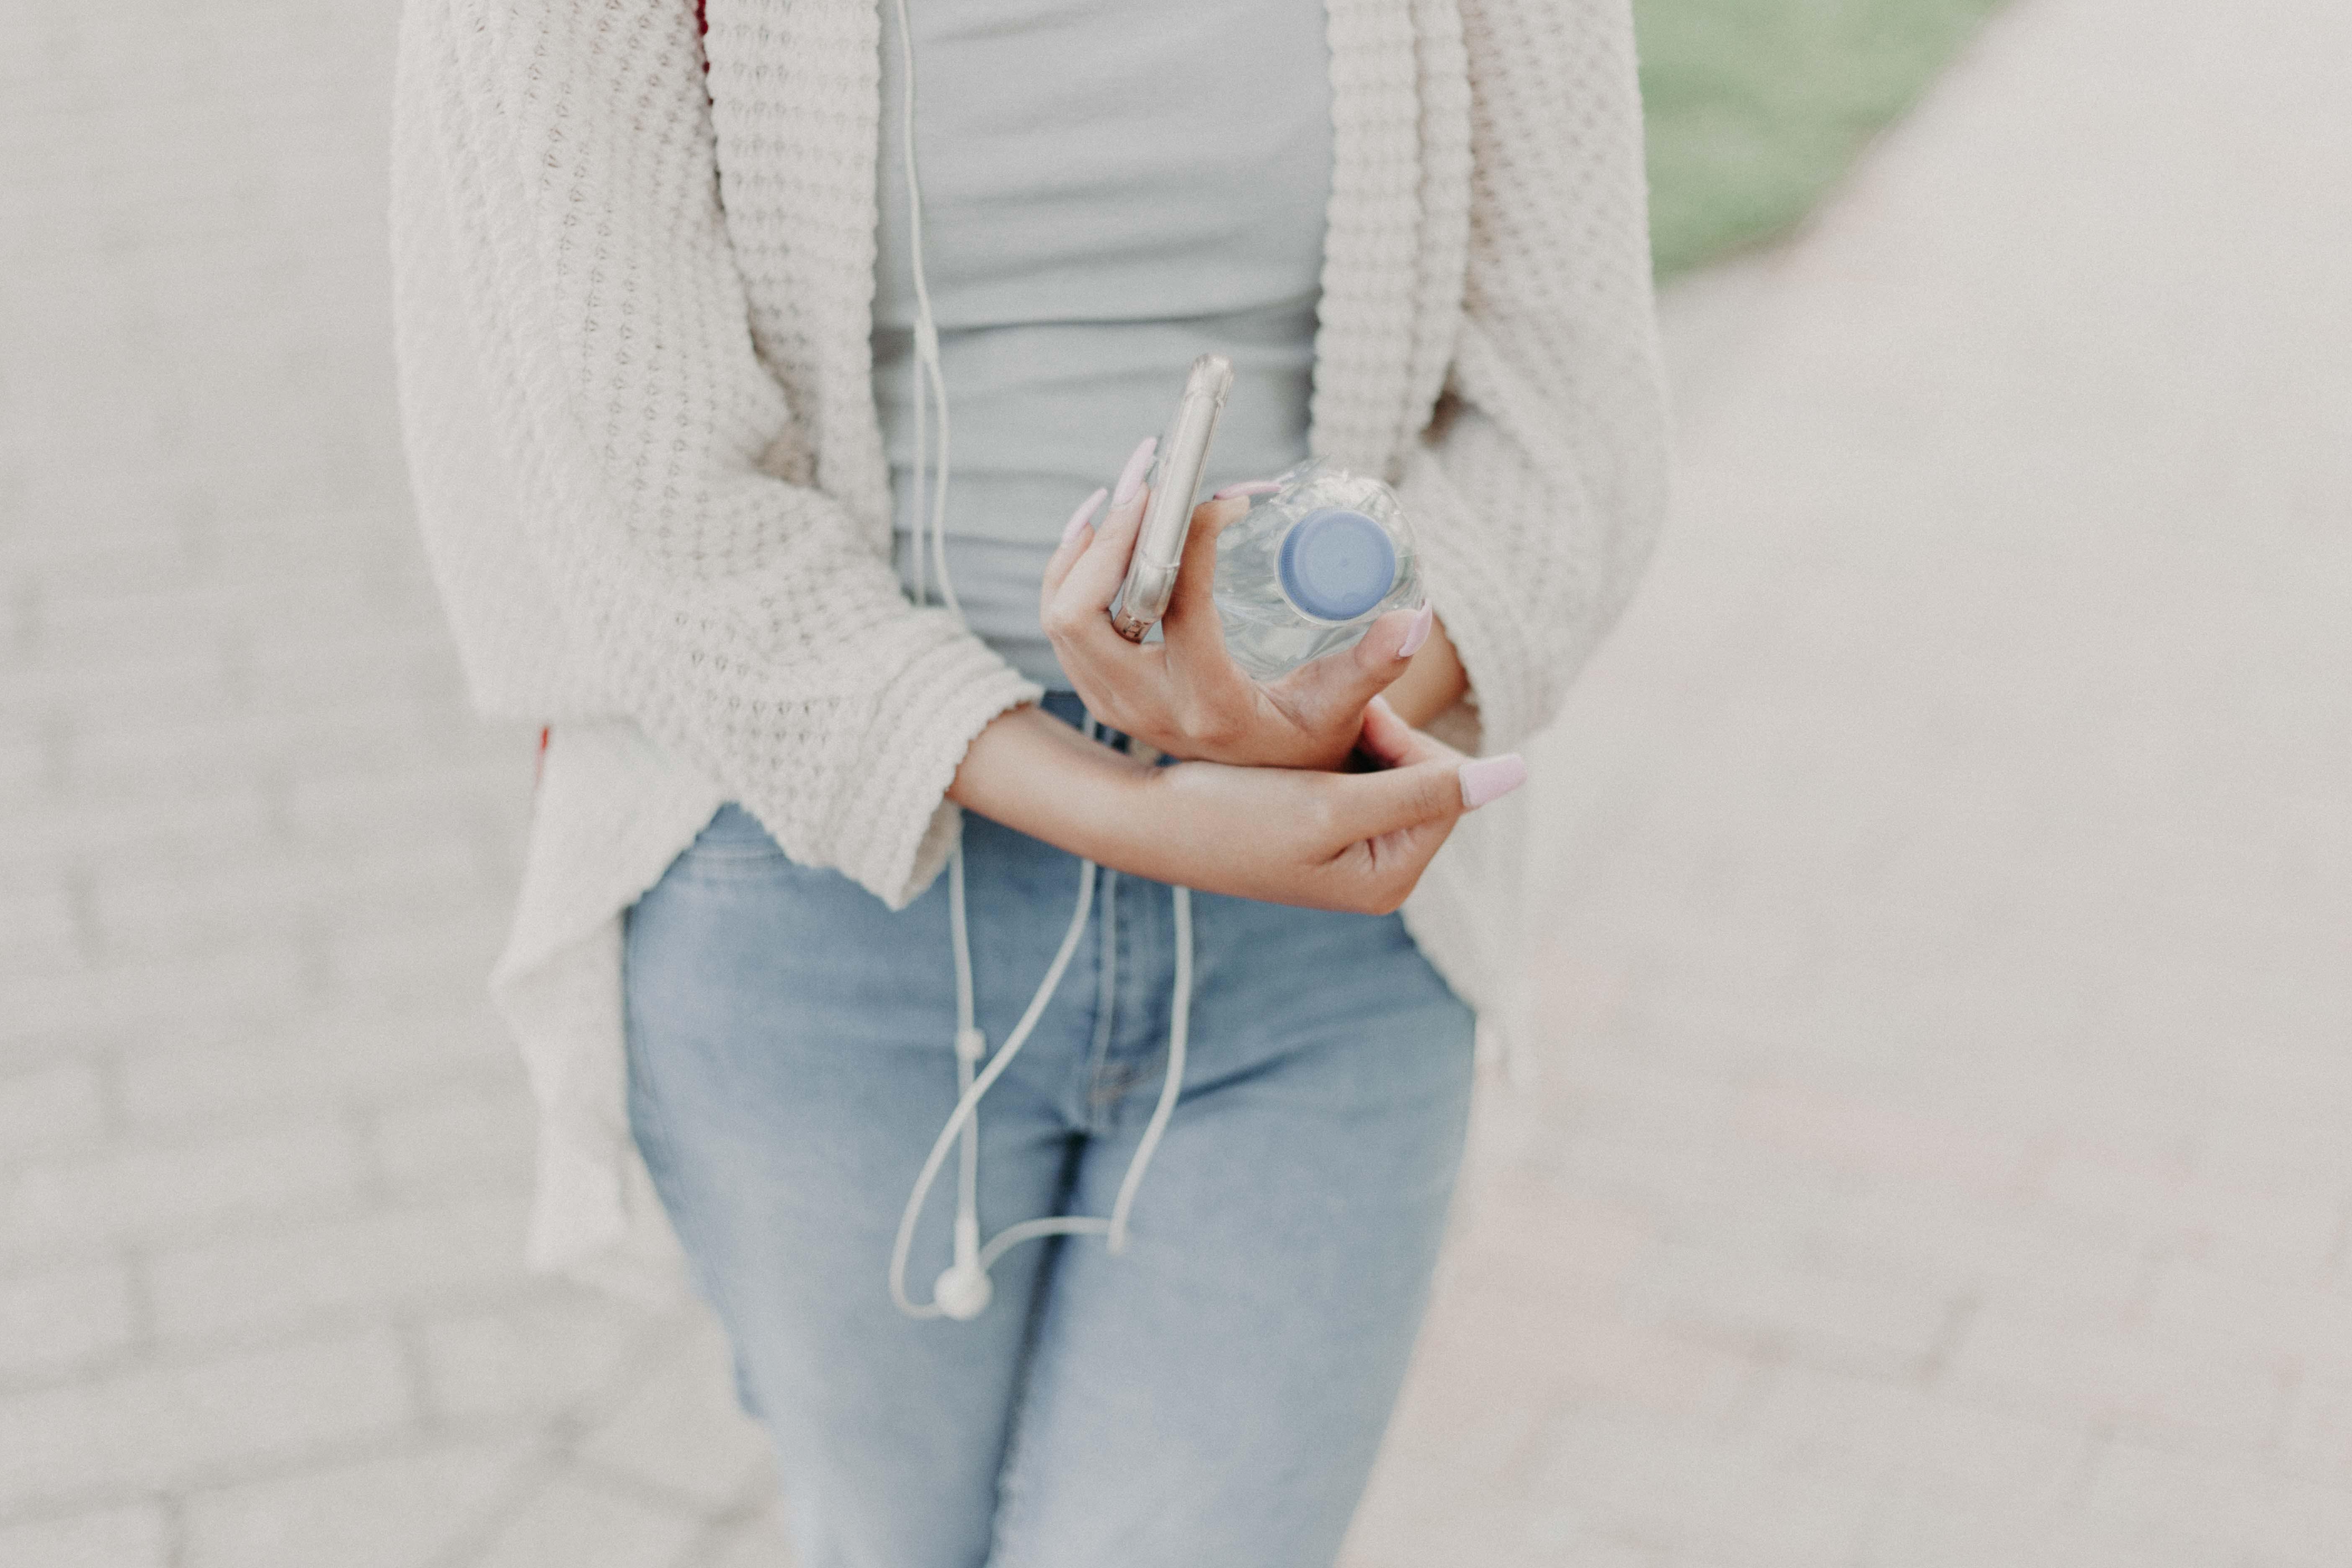 Woman Wearing White Cardigan Holding Plastic Bottle